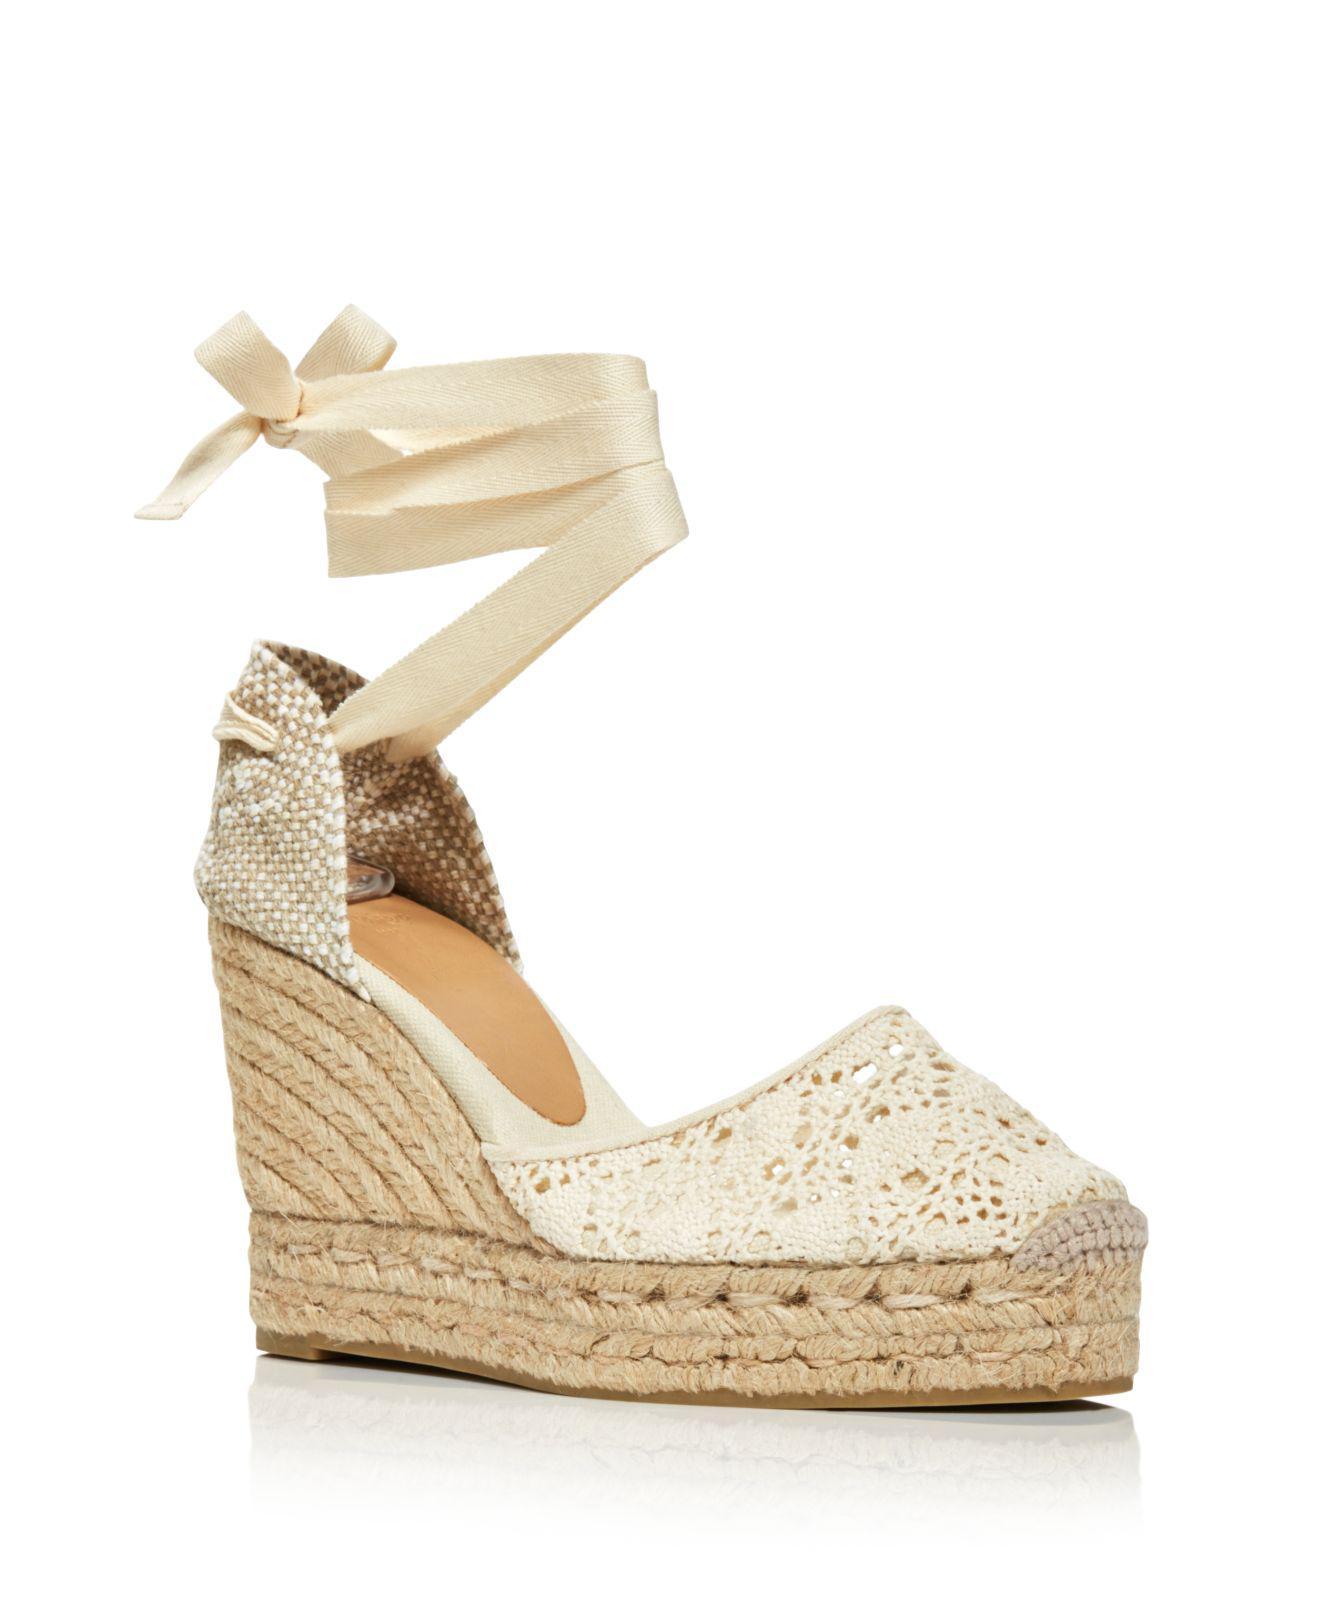 Castaner Women's Lula Ankle Tie Platform Wedge Espadrille Sandals Cheap Sale Outlet Locations 2t28BE